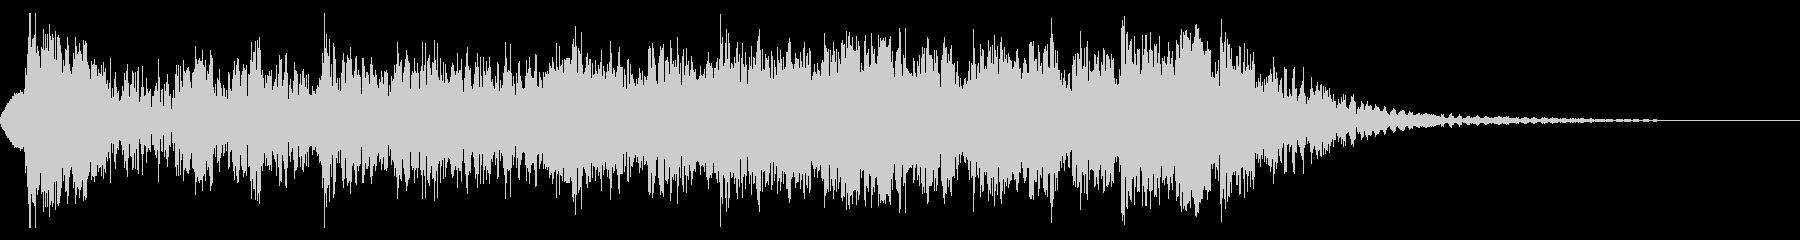 YouTube尺八による和風ジングル02の未再生の波形